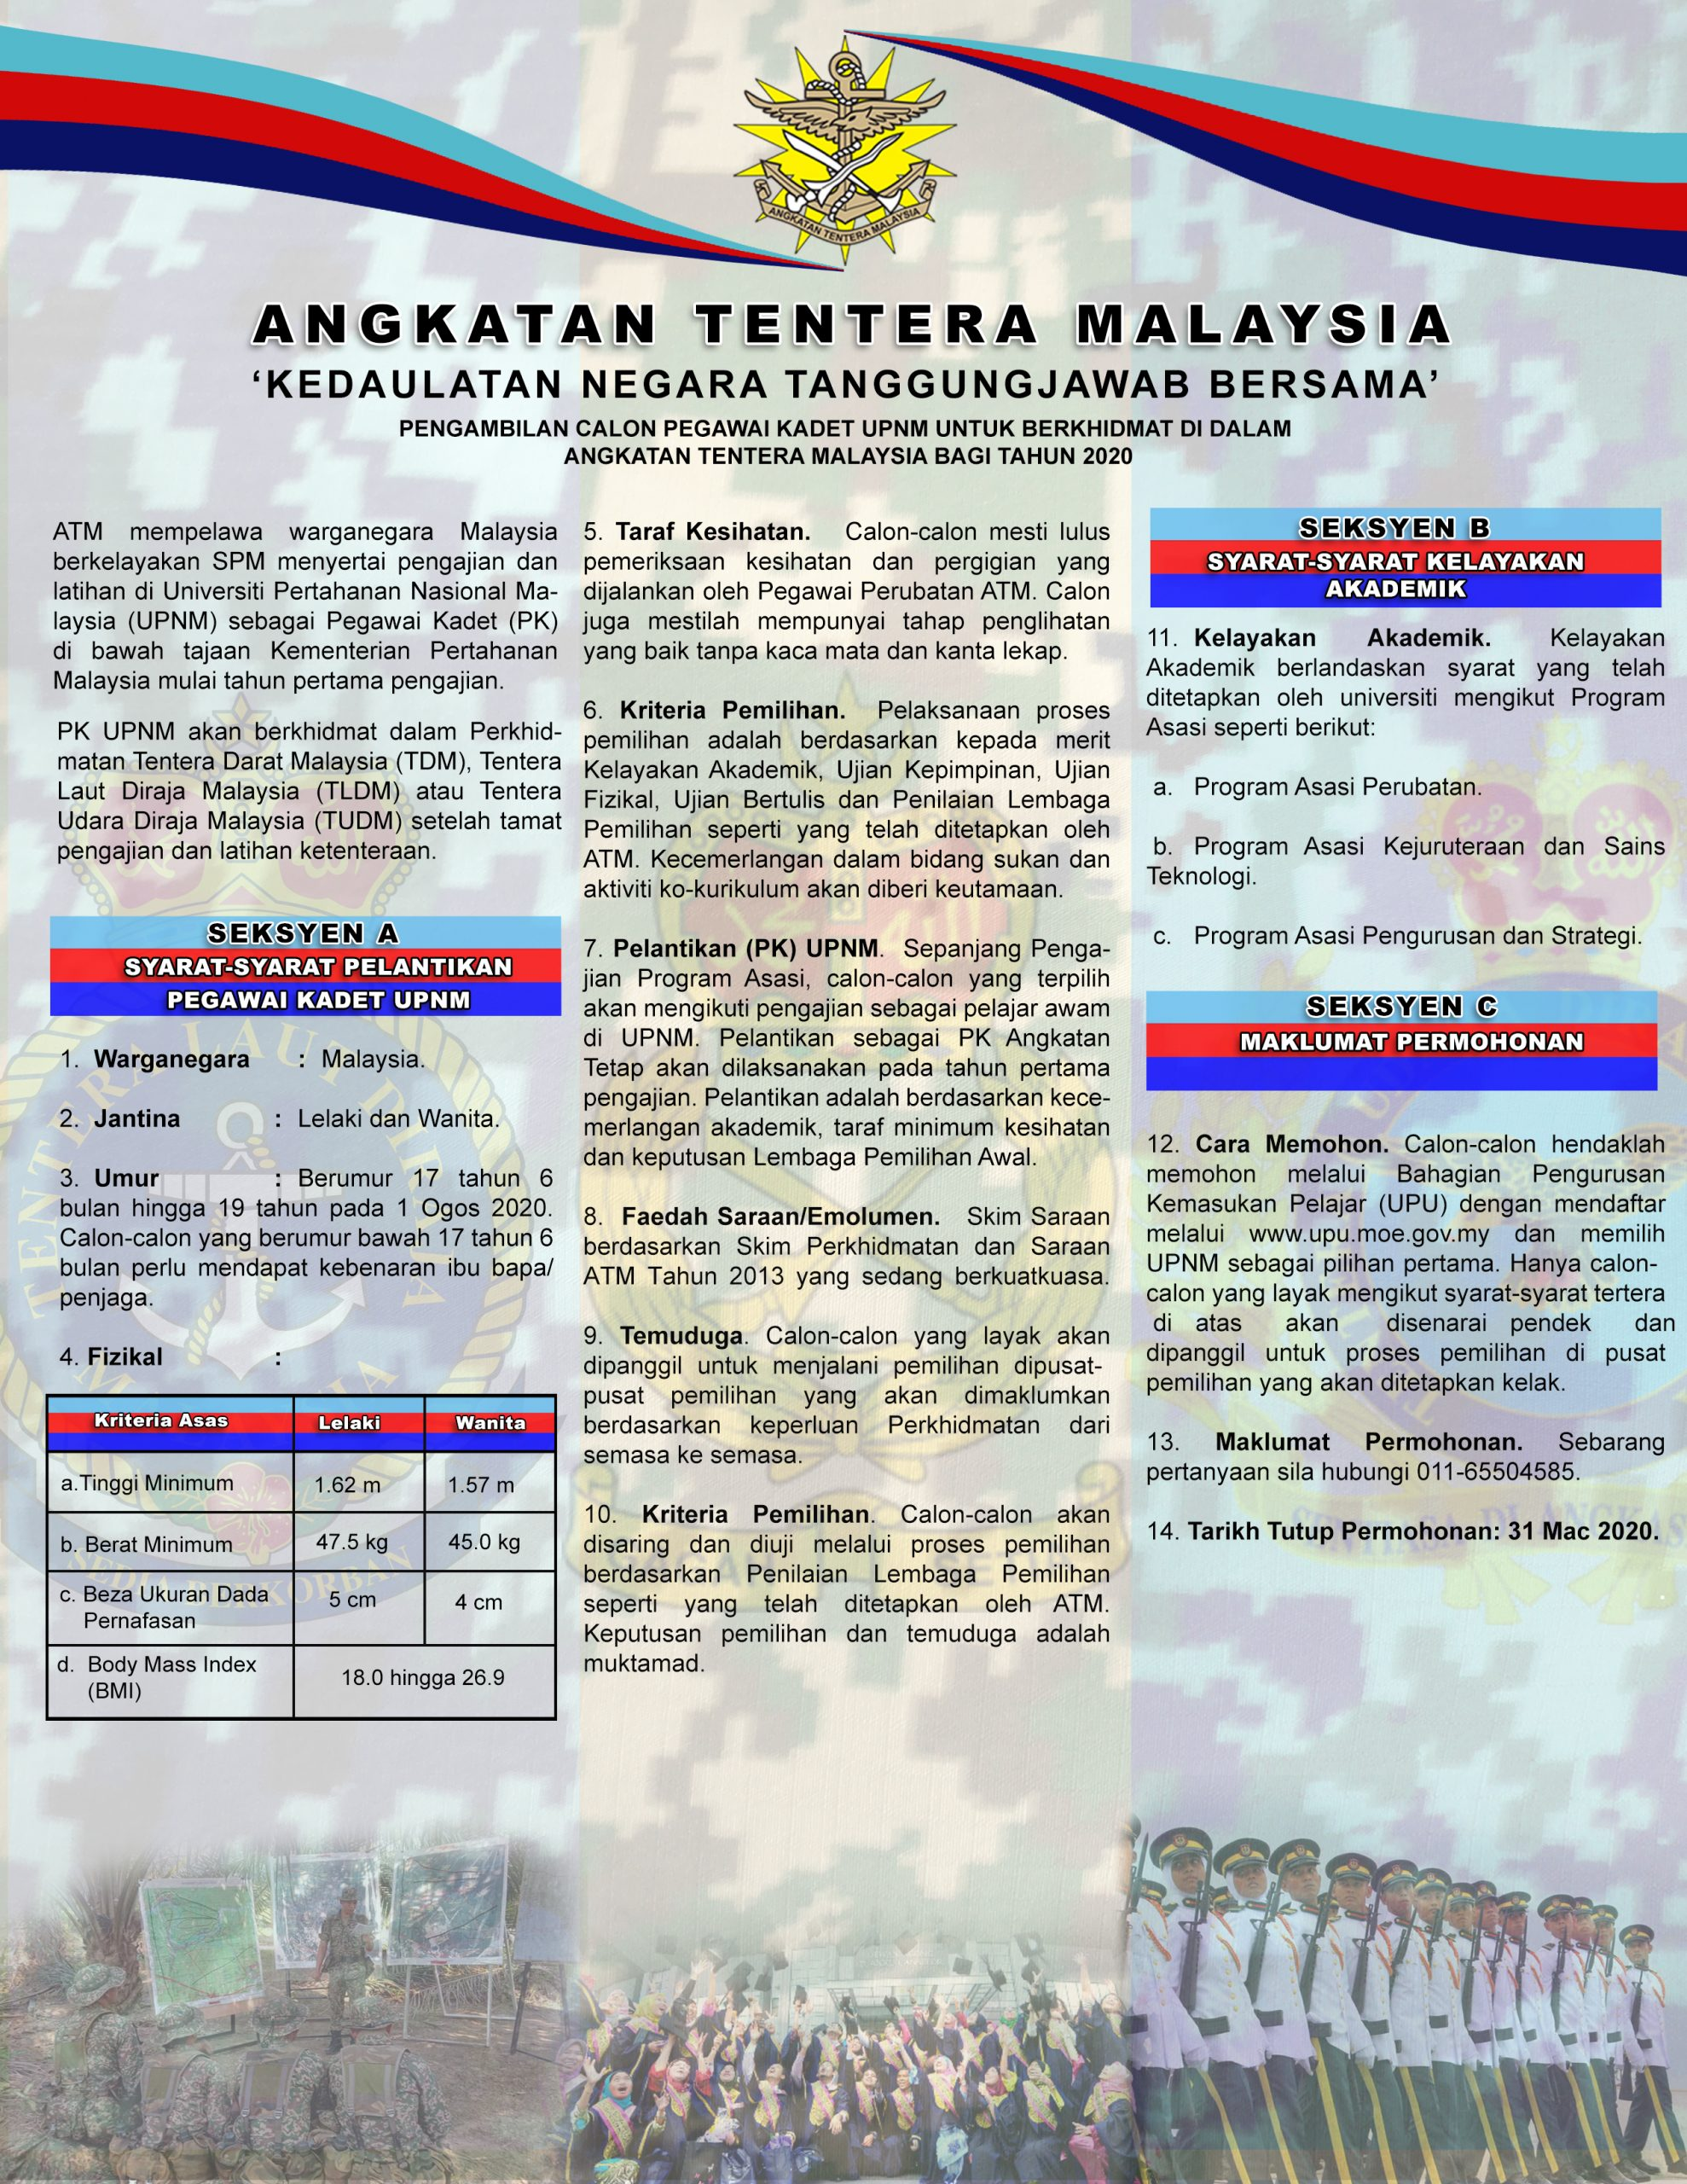 Iklan Jawatan Kosong Angkatan Tentera Malaysia (ATM)